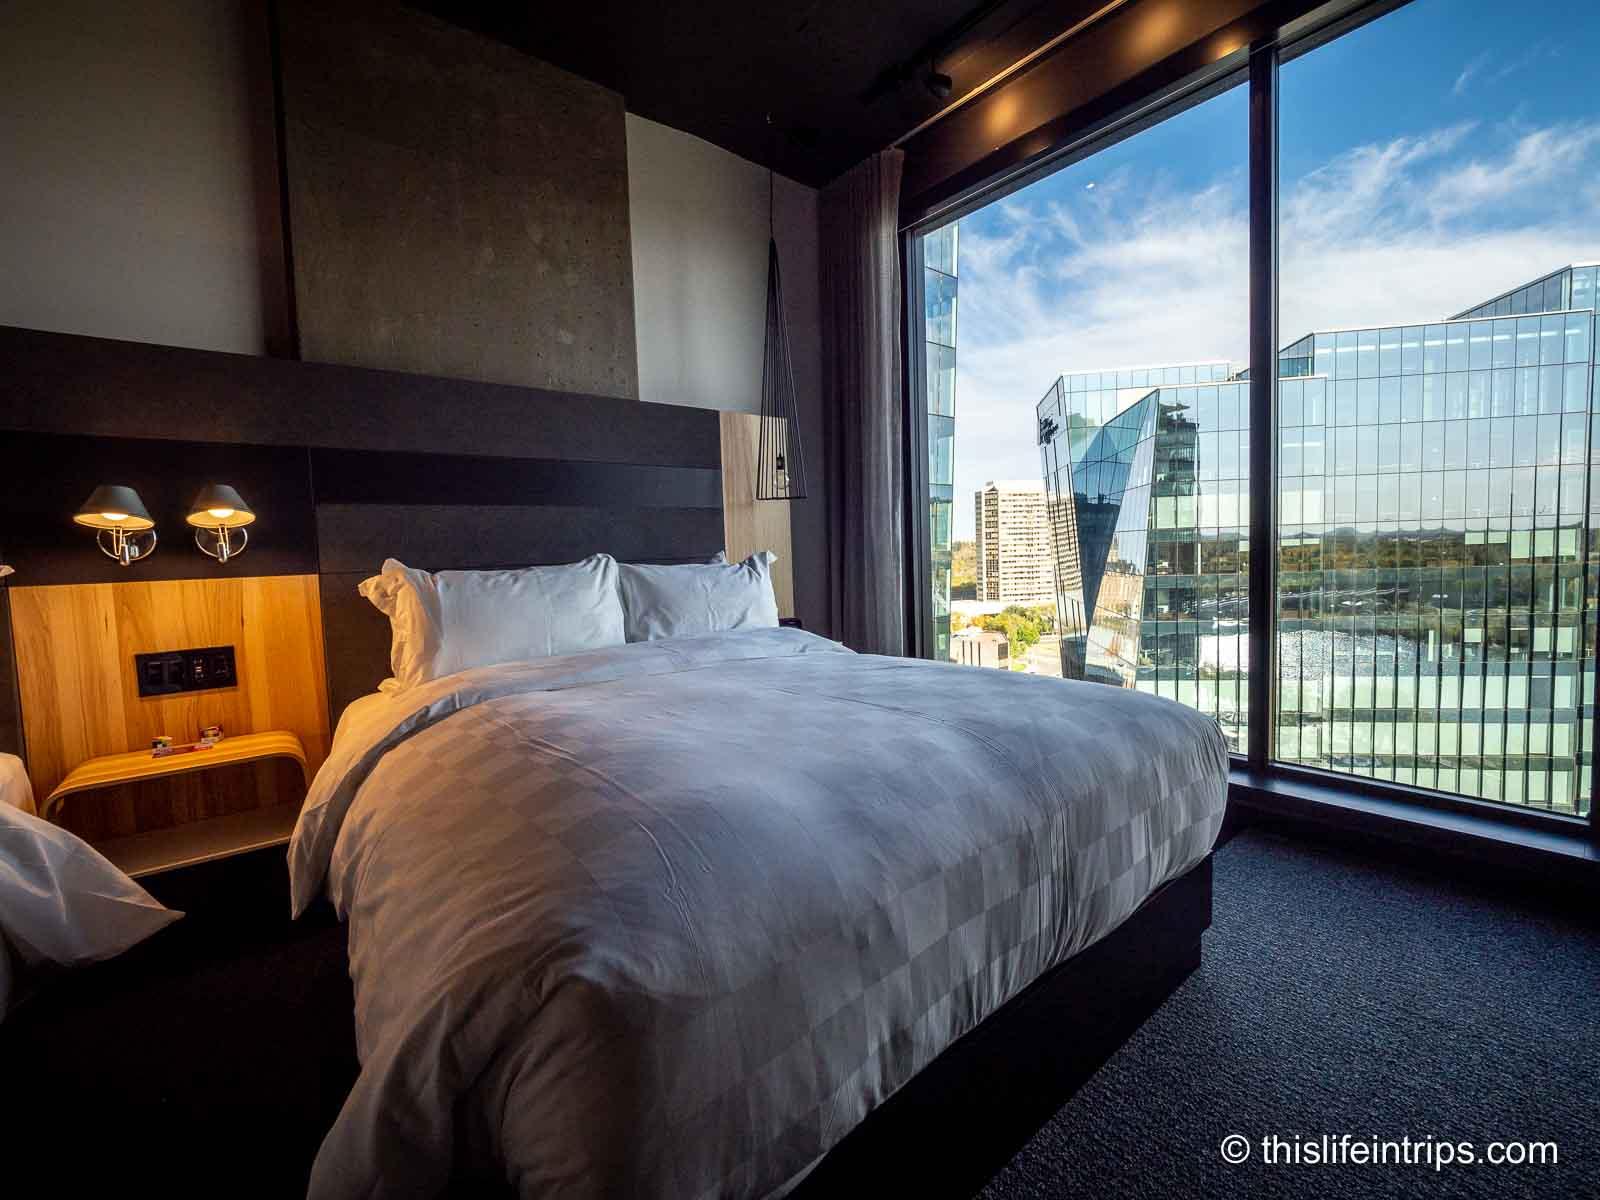 Alt Hotel Saskatoon Review – Sundown in the Paris of the Prairies